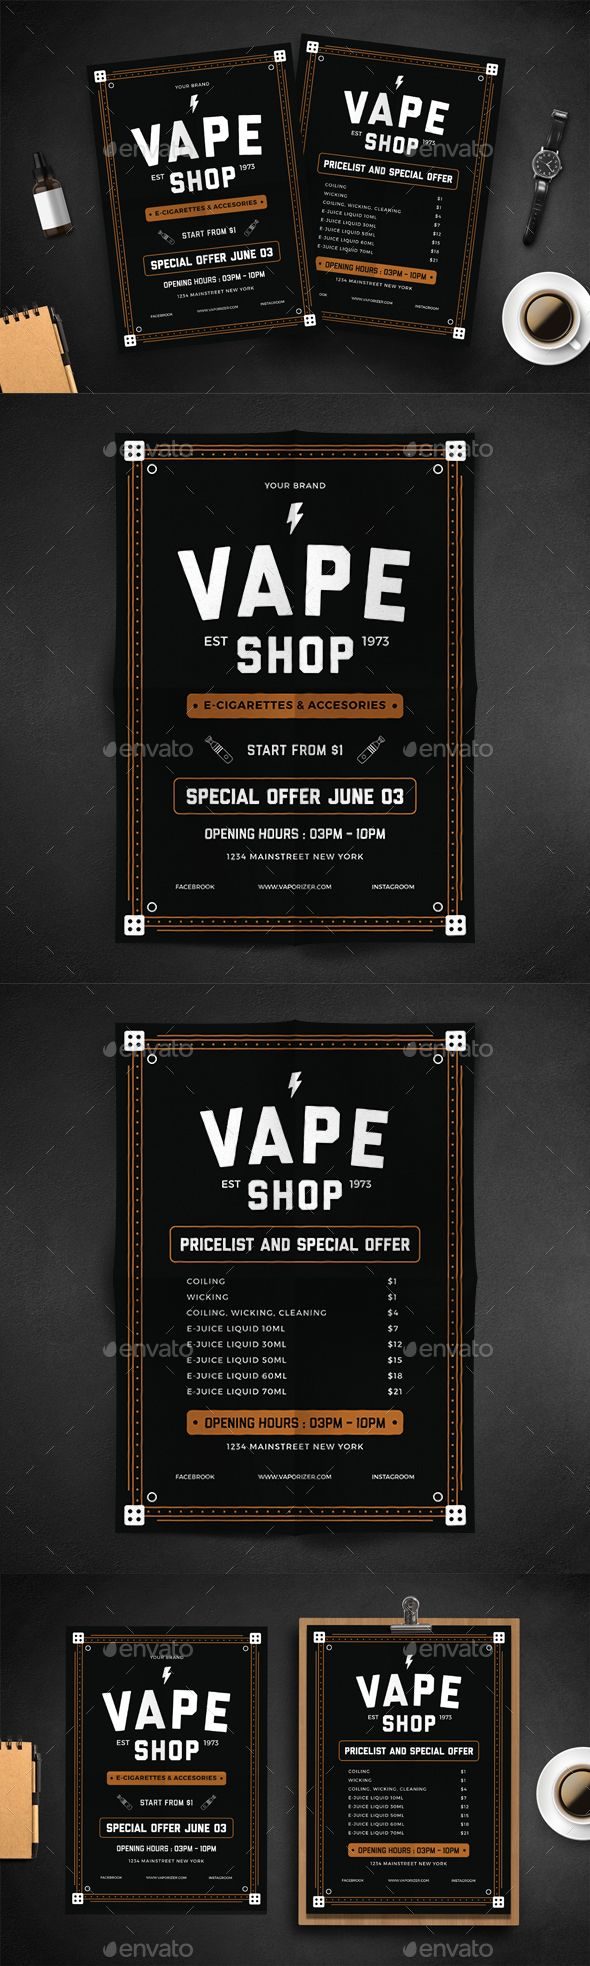 Vape Shop Flyer Menu Template PSD, AI Illustrator